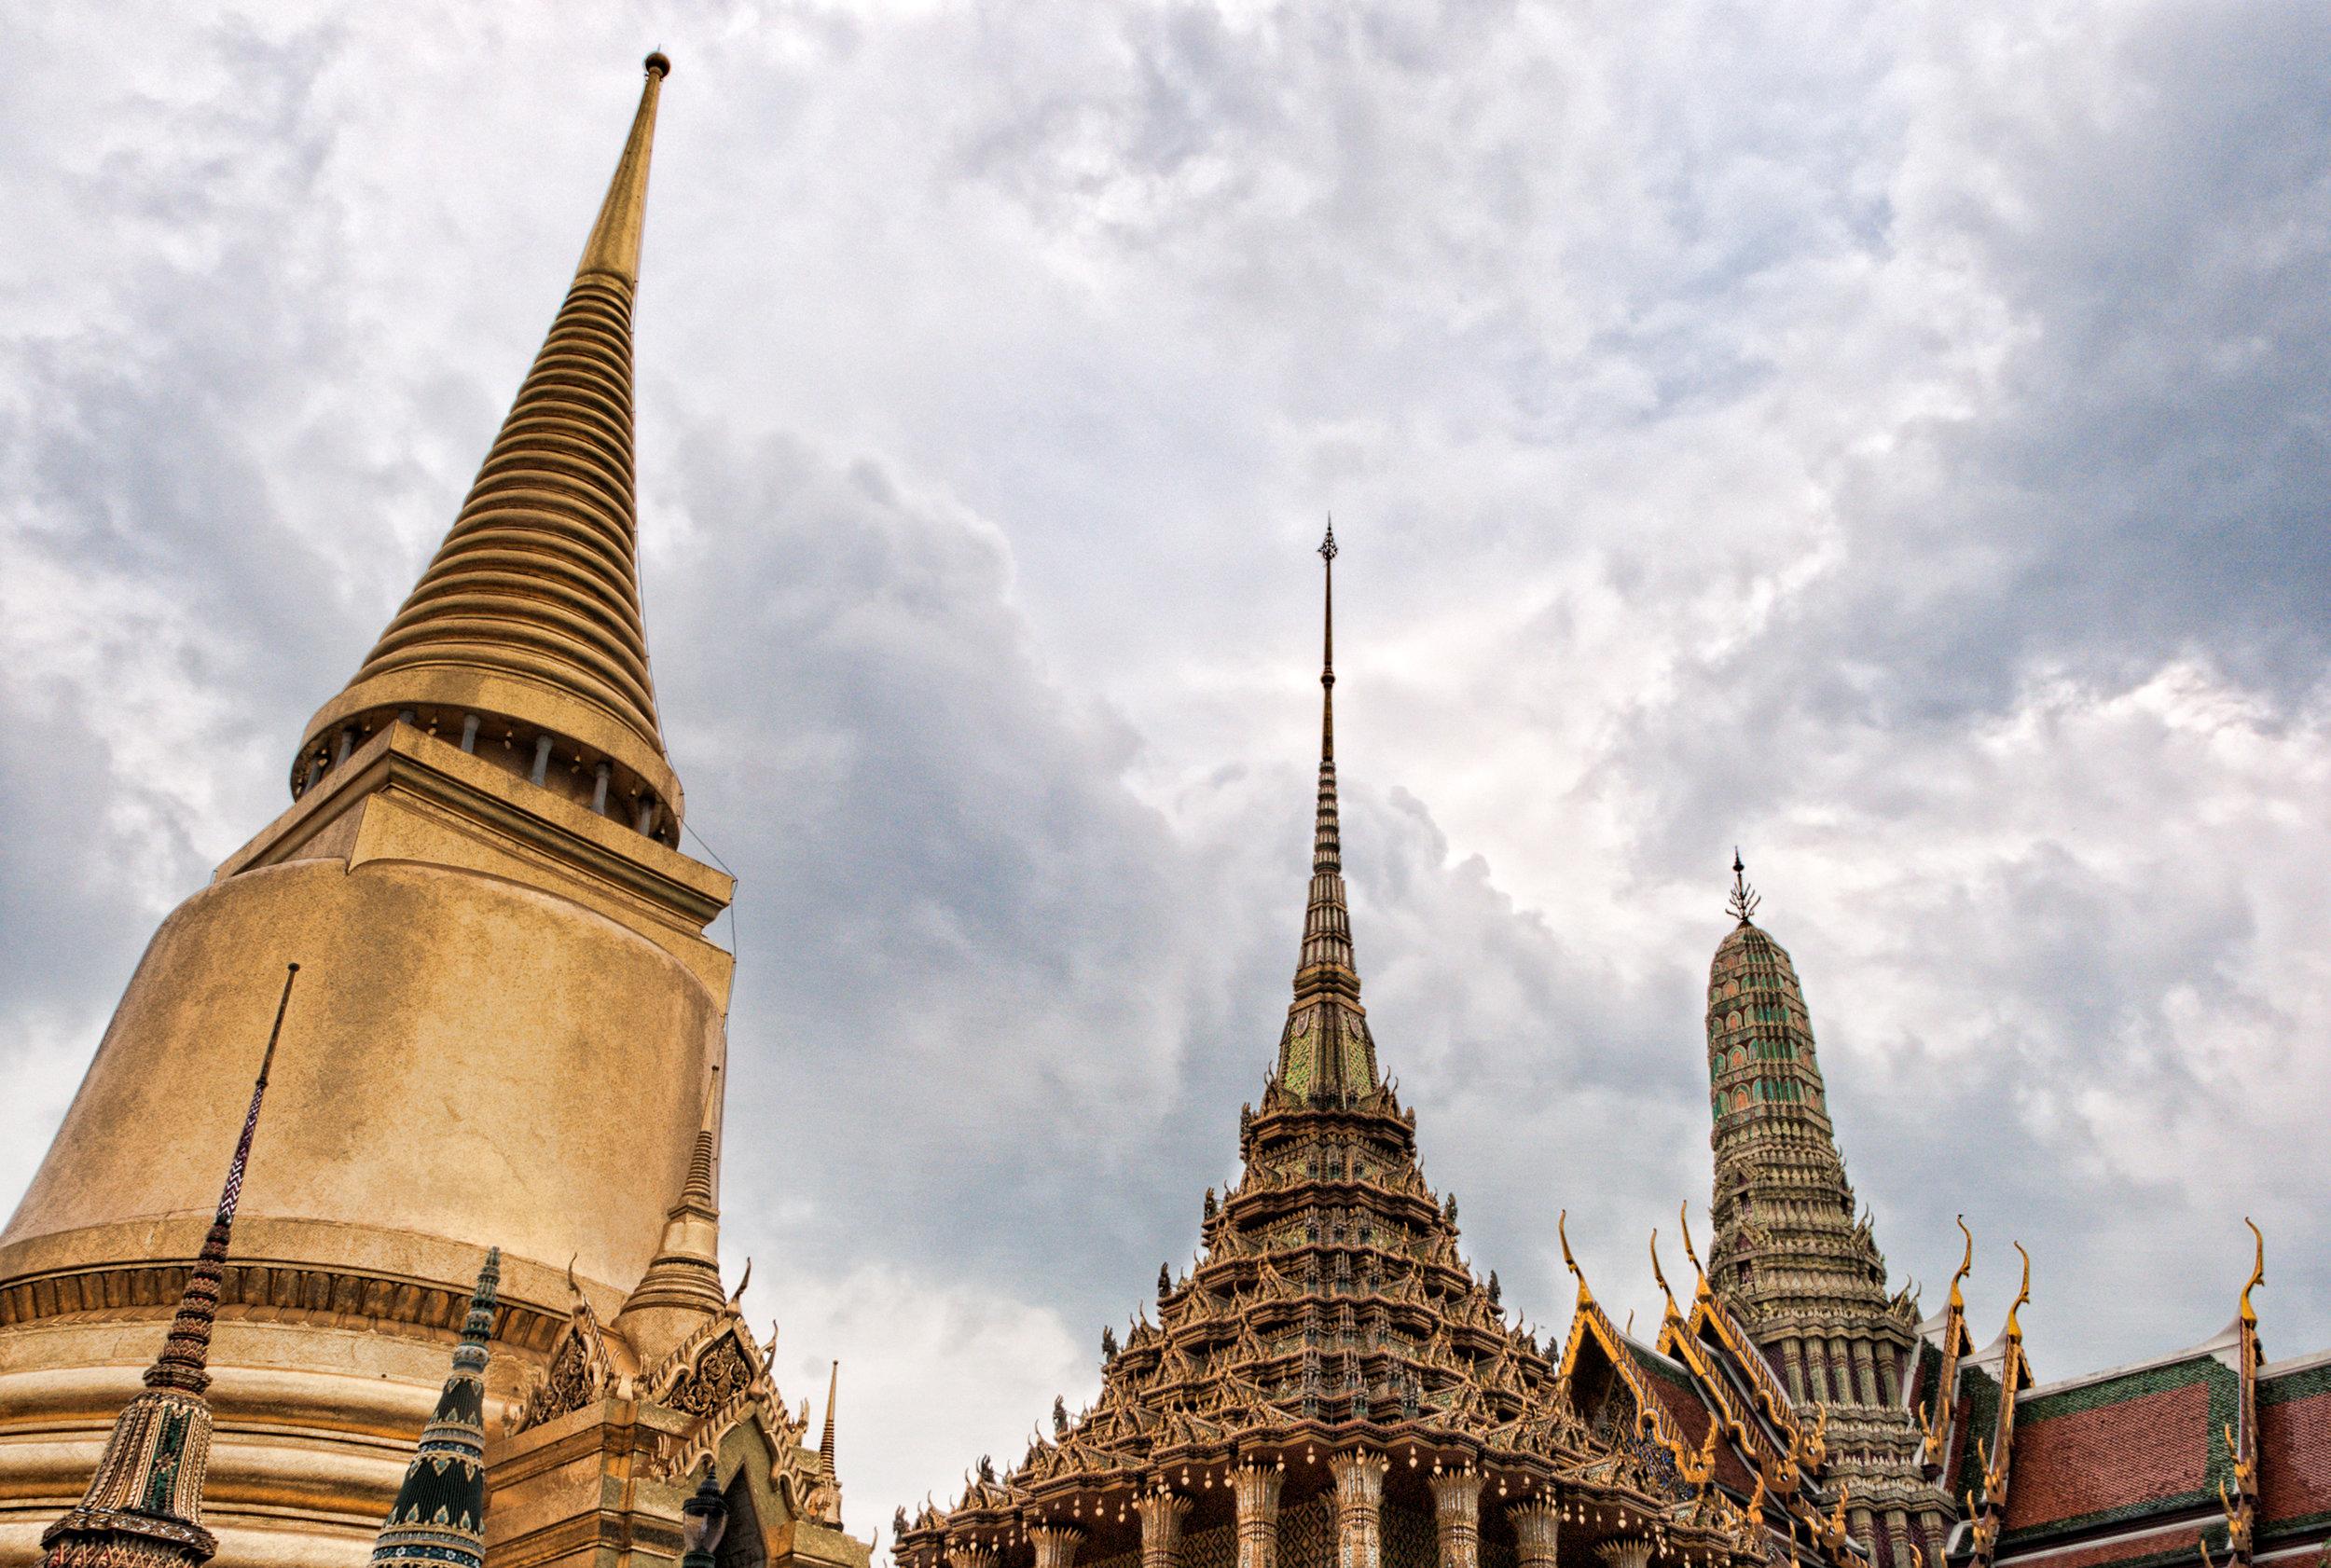 Thailand-John Bardell__DSC3587a.jpg